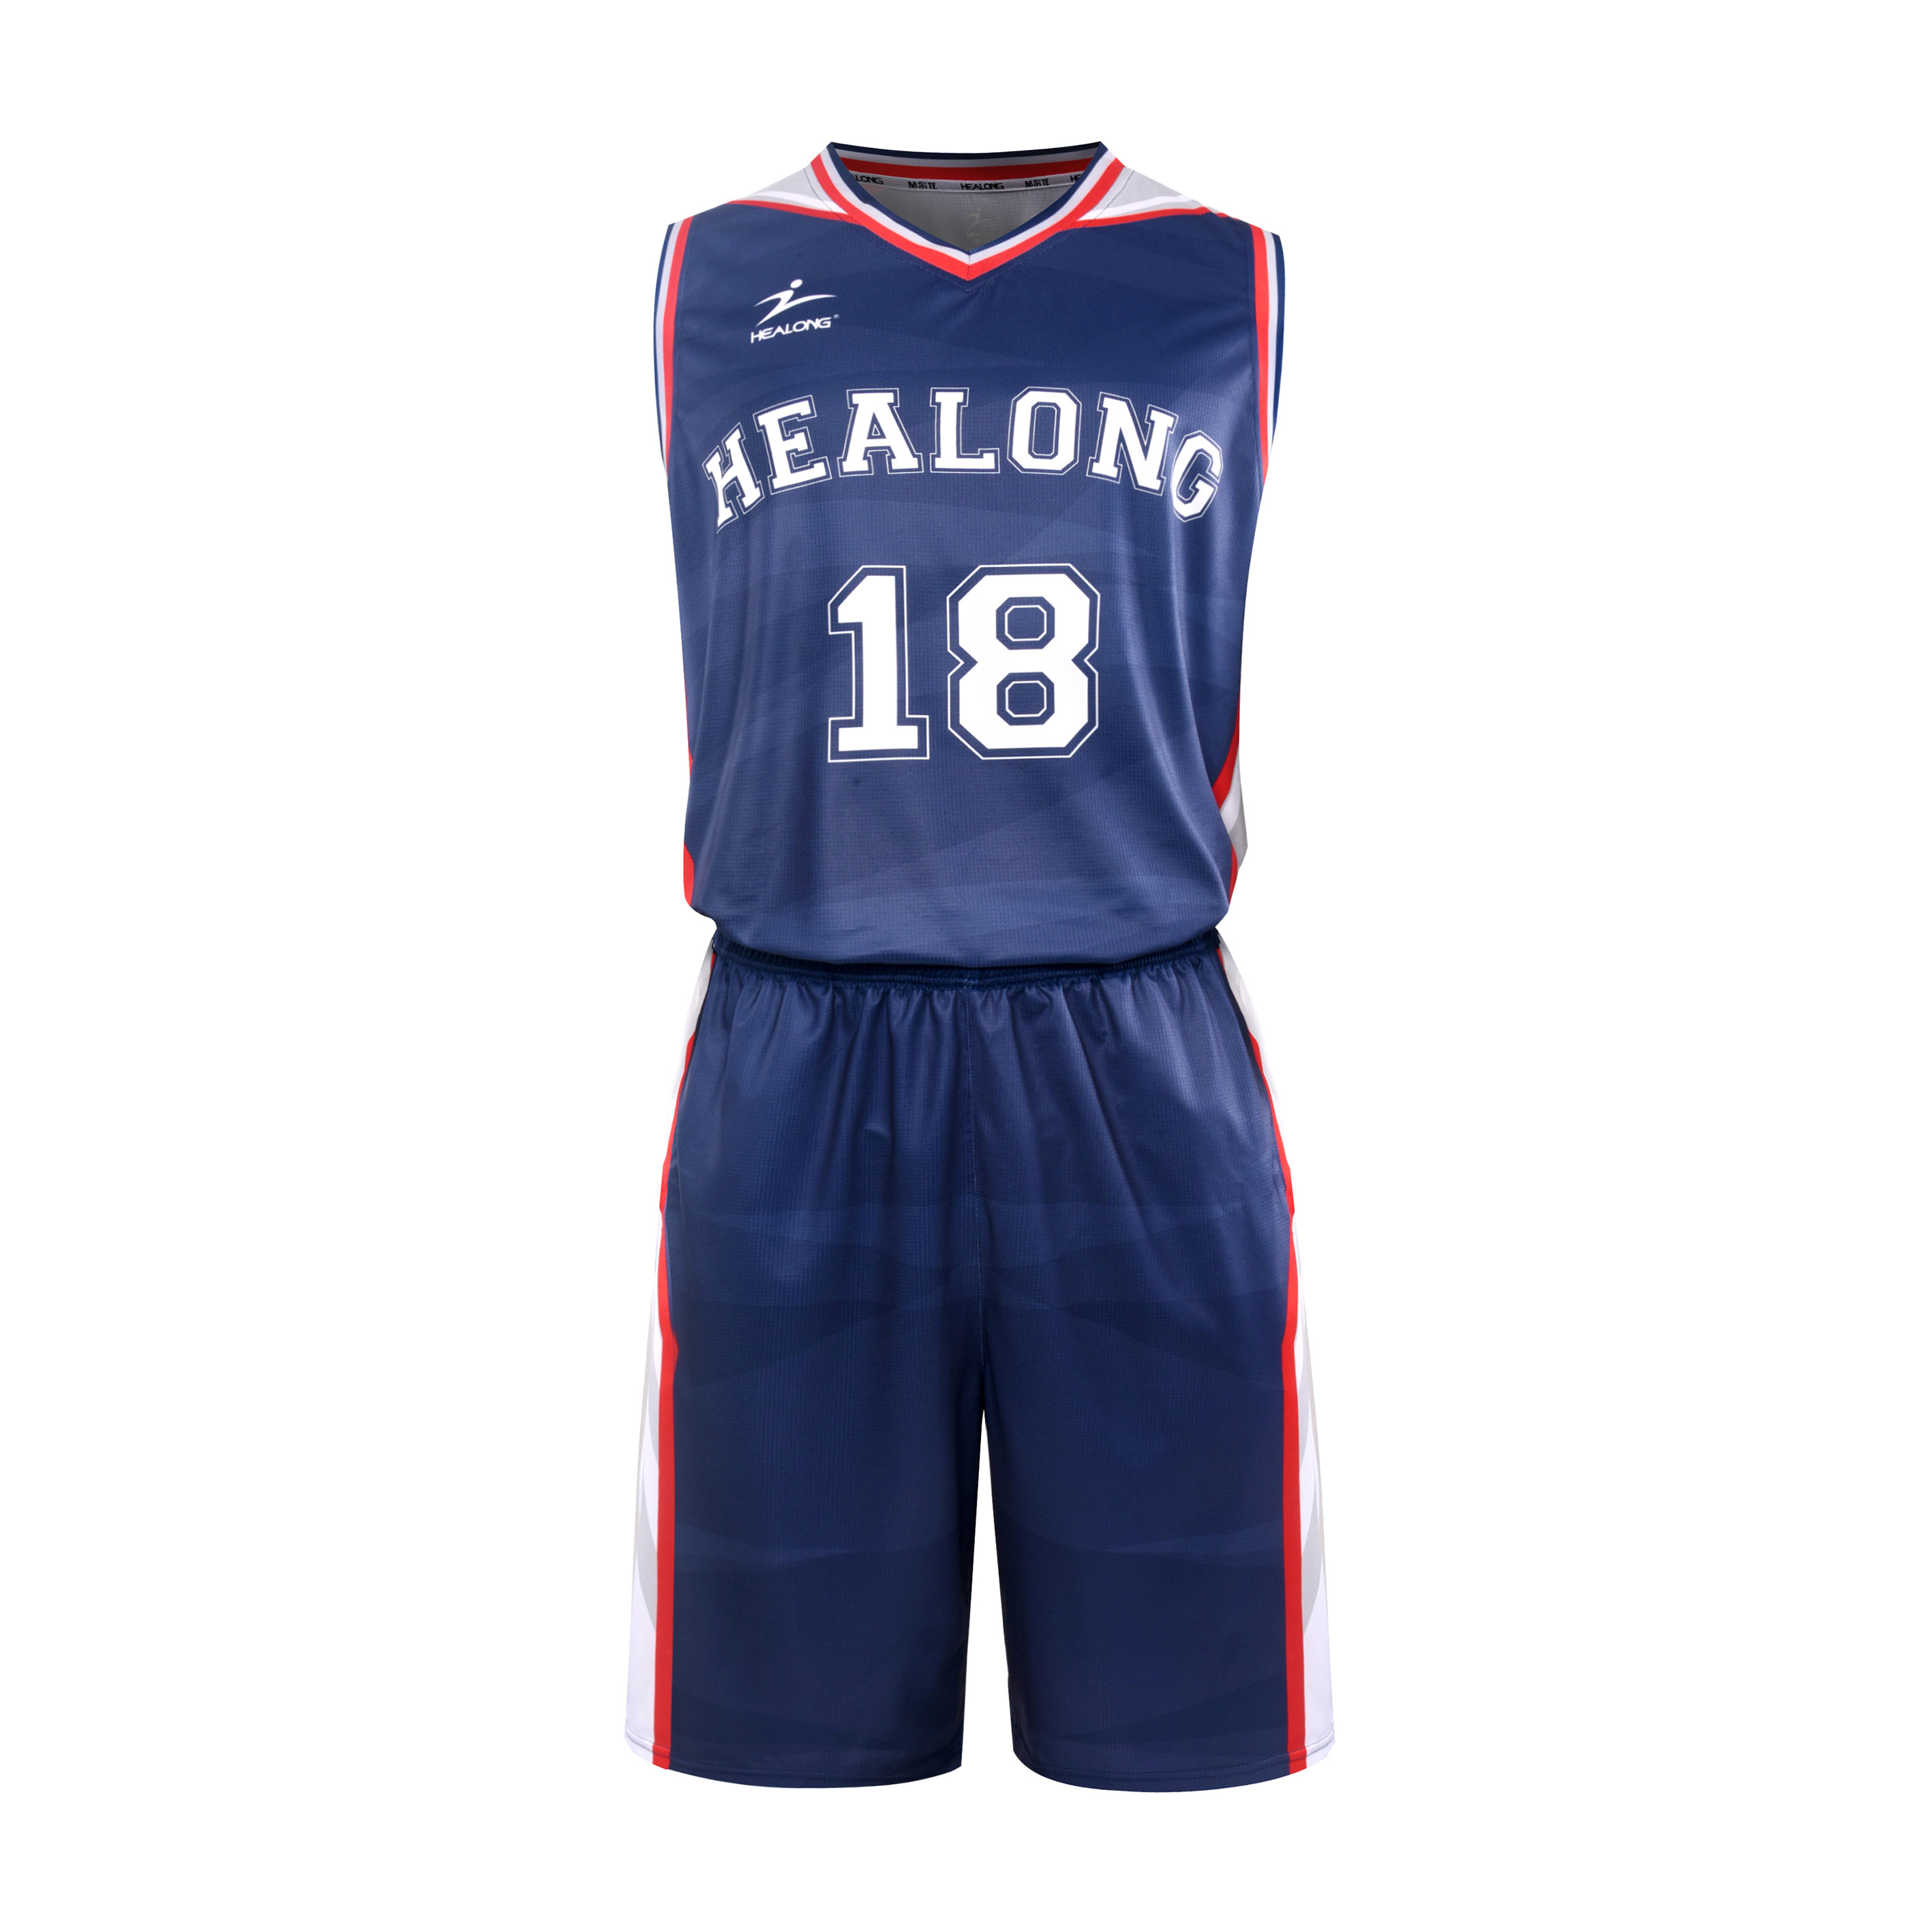 2a62b7baf979 Customize Basketball Uniform Orange Black Reversible Red College Polyester  Blue Customisable Basketball Jersey